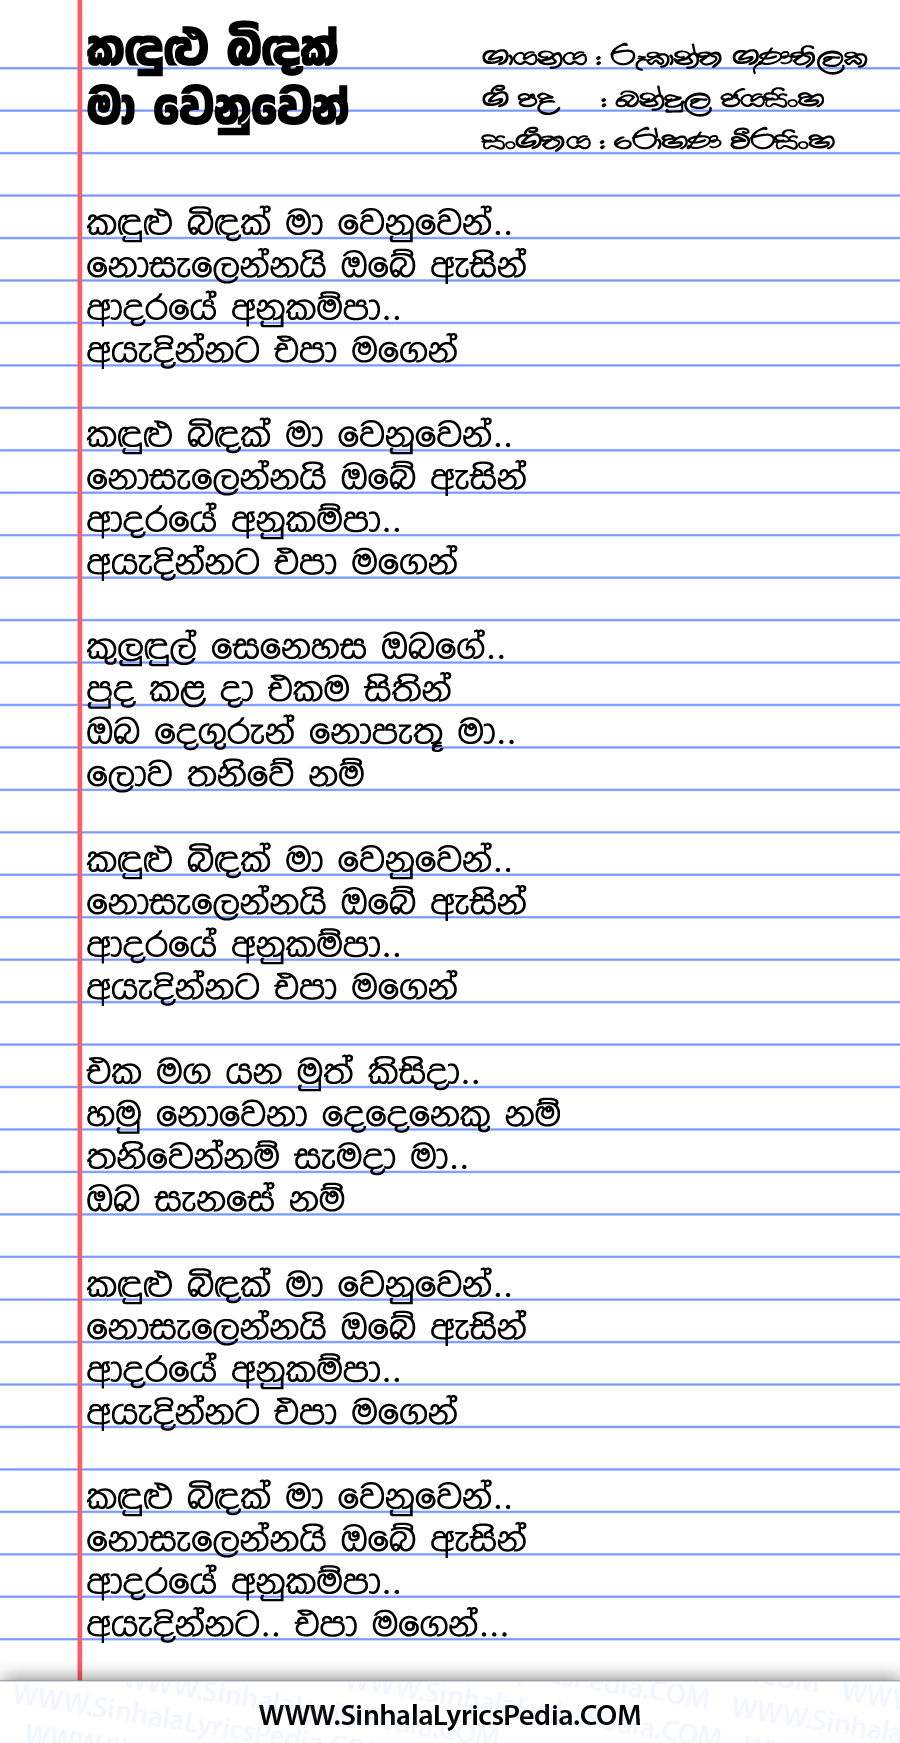 Kandulu Bidak Ma Wenuwen Song Lyrics